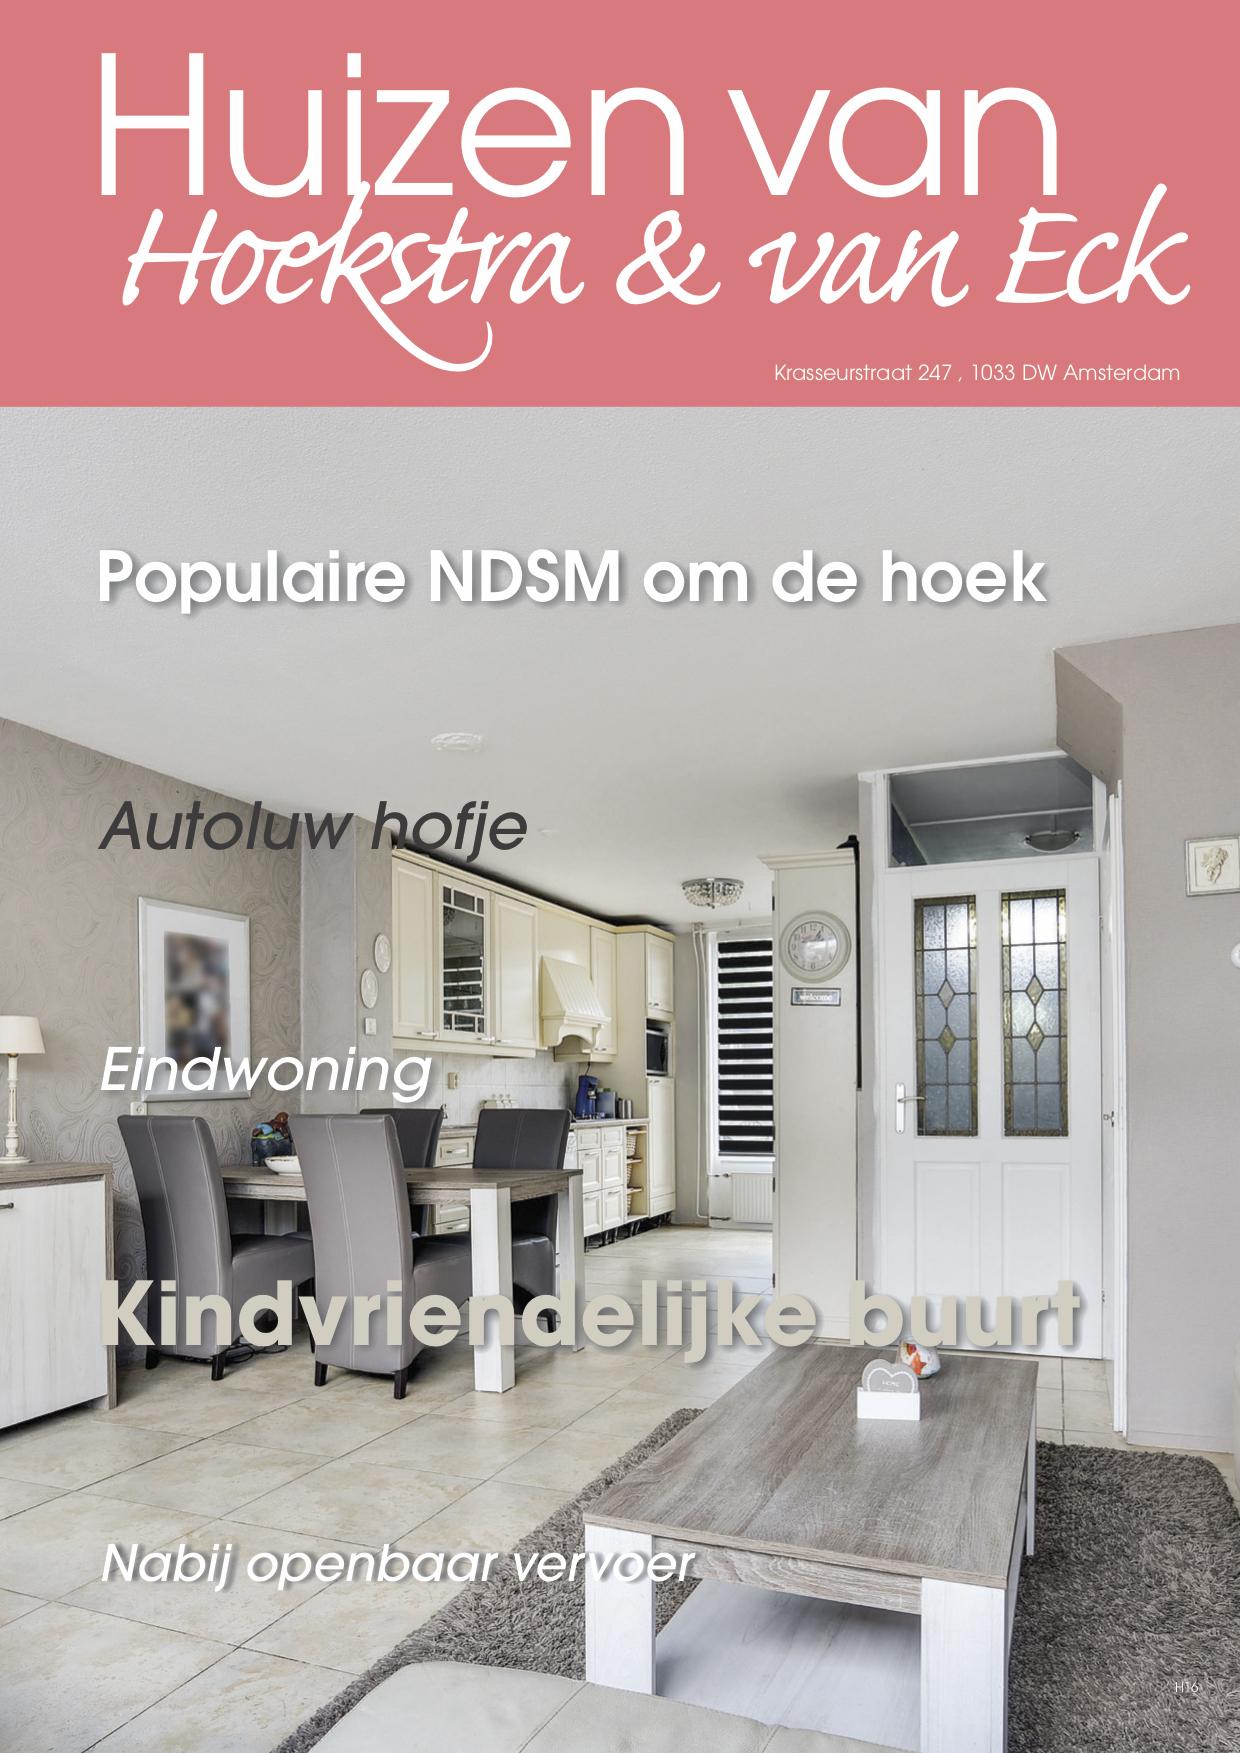 Krasseurstraat 247 1033 Dw Amsterdam